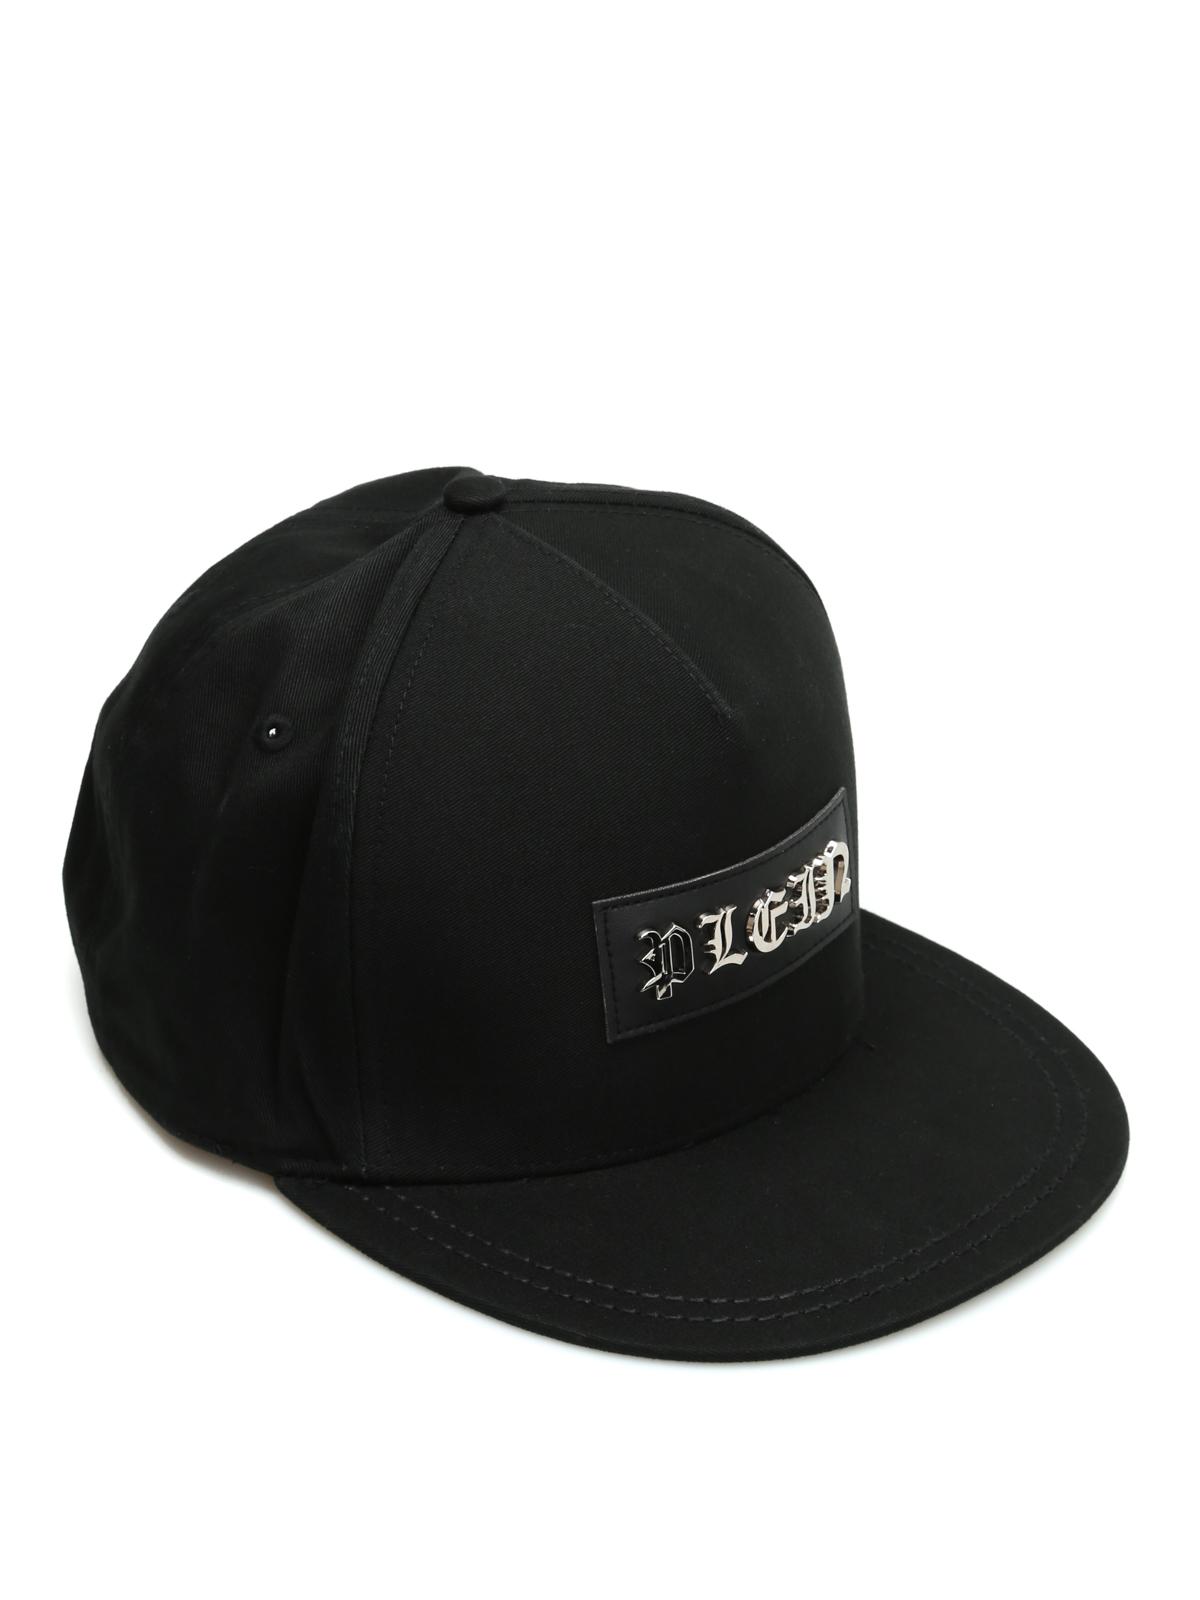 gothic baseball cap by philipp plein hats caps ikrix. Black Bedroom Furniture Sets. Home Design Ideas